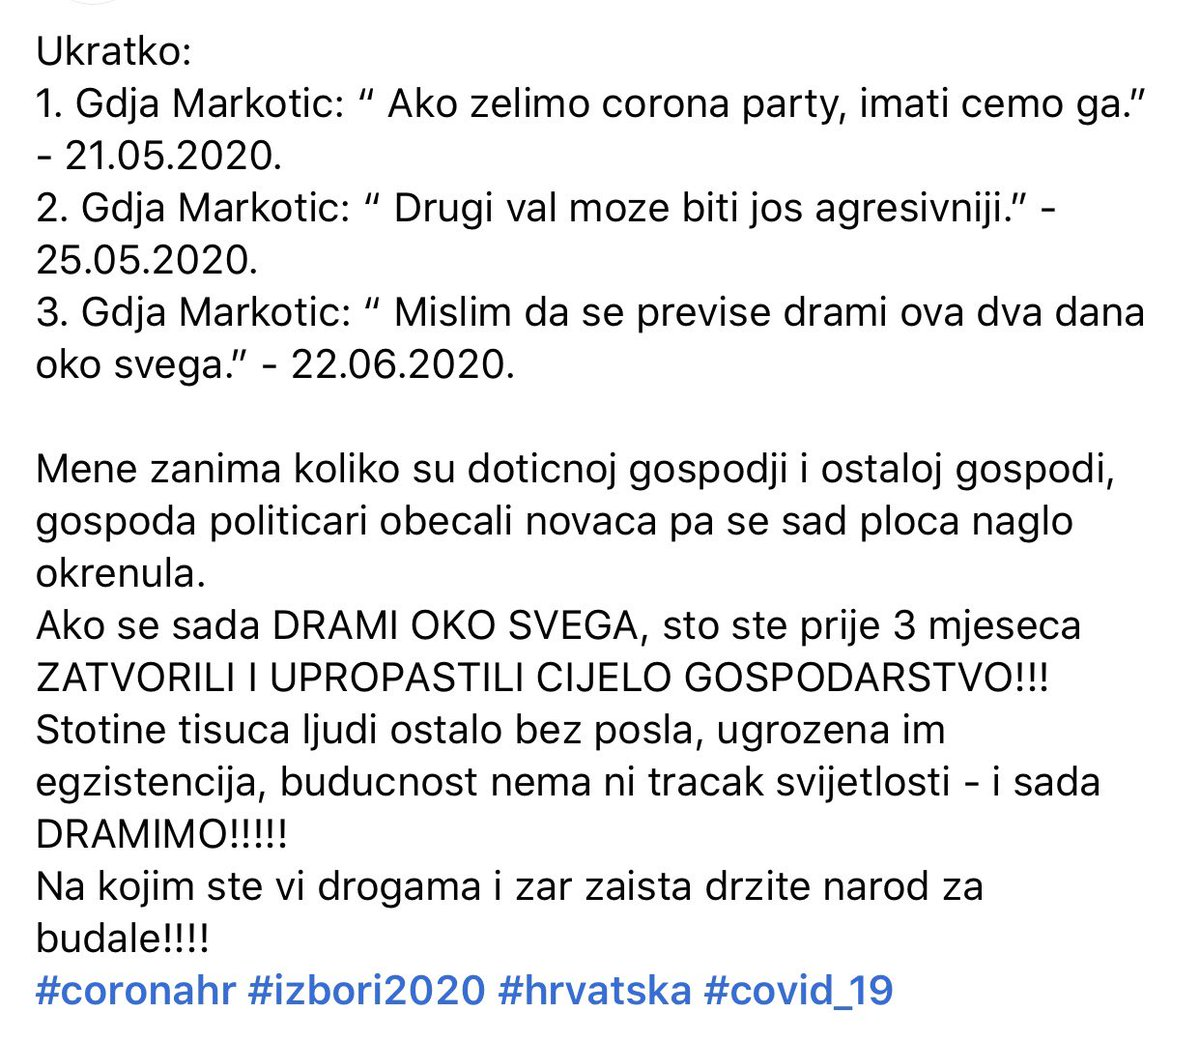 Hrvatska U Srcu Chat - Darrenee